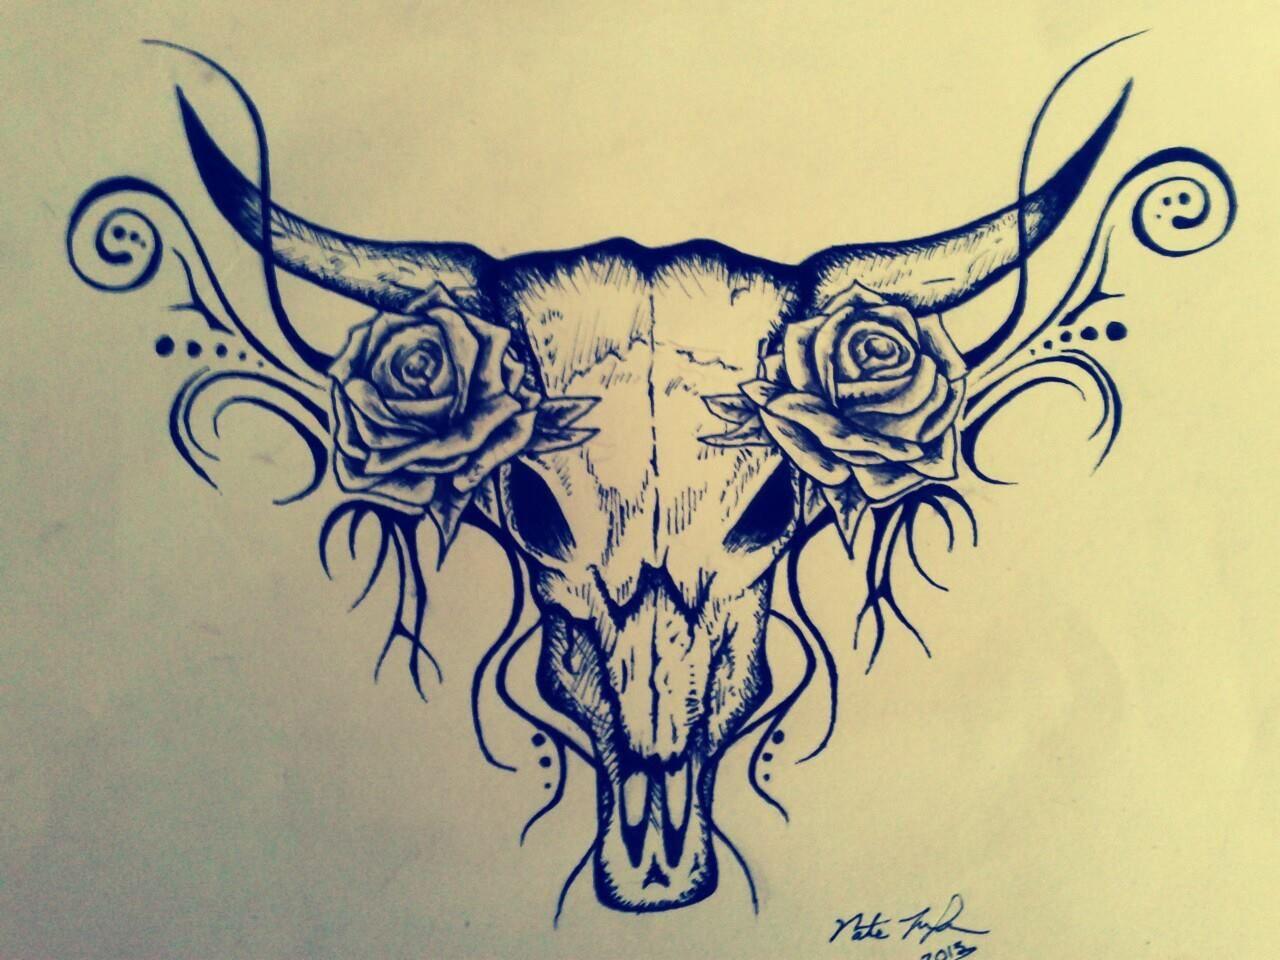 Tattoo Design Bull Skull Myfolio Bull Skull Tattoos Bull Tattoos Taurus Tattoos